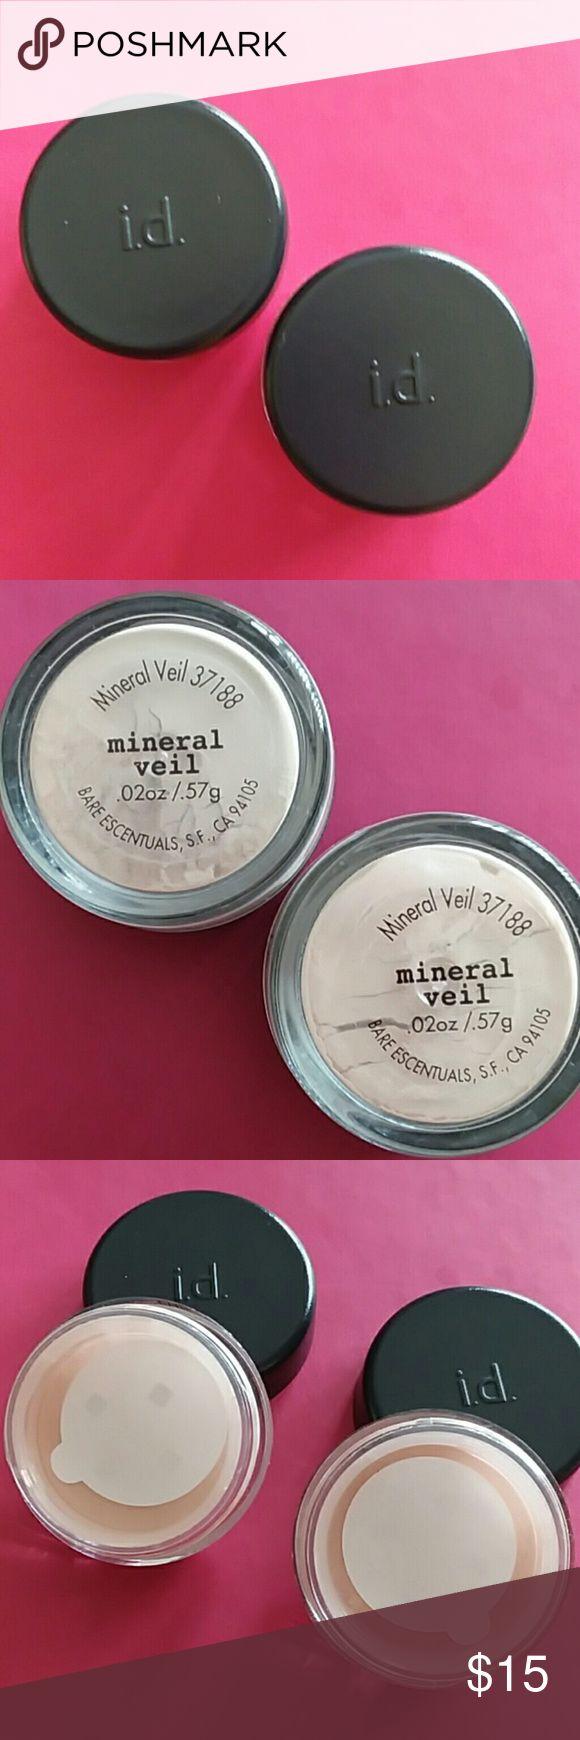 Bare Escentuals Mineral Veil - 2 small, .02oz. ea. Two new, never used Bare Escentuals Mineral Veils. Each is .02 oz. Bare Escentuals Makeup